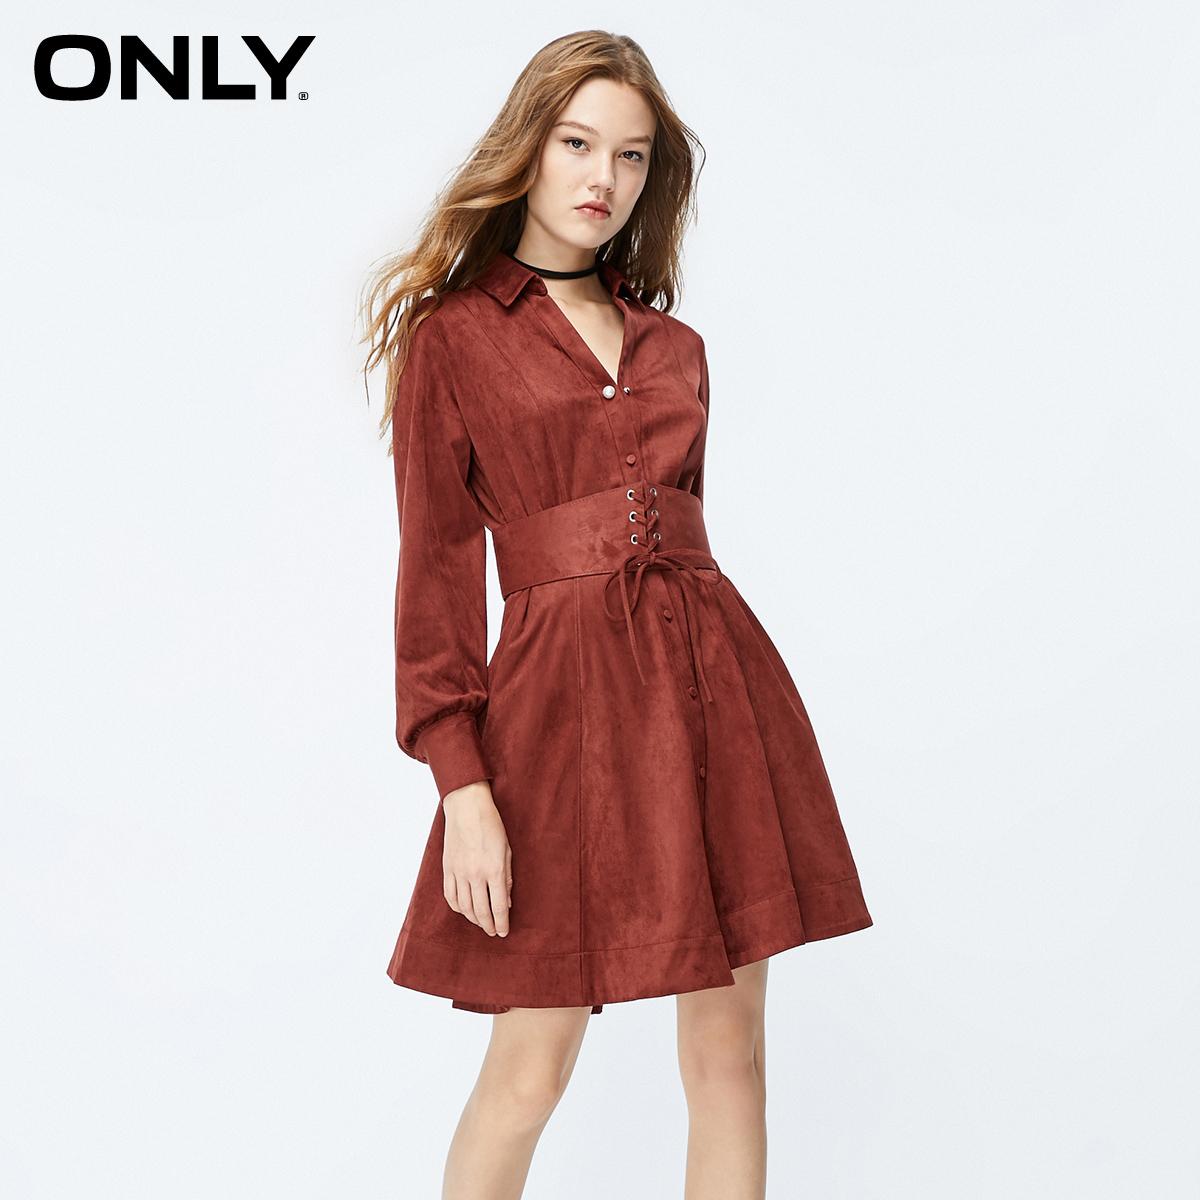 ONLY夏季新款复古绒面收腰显瘦长袖裙子连衣裙女|119307572